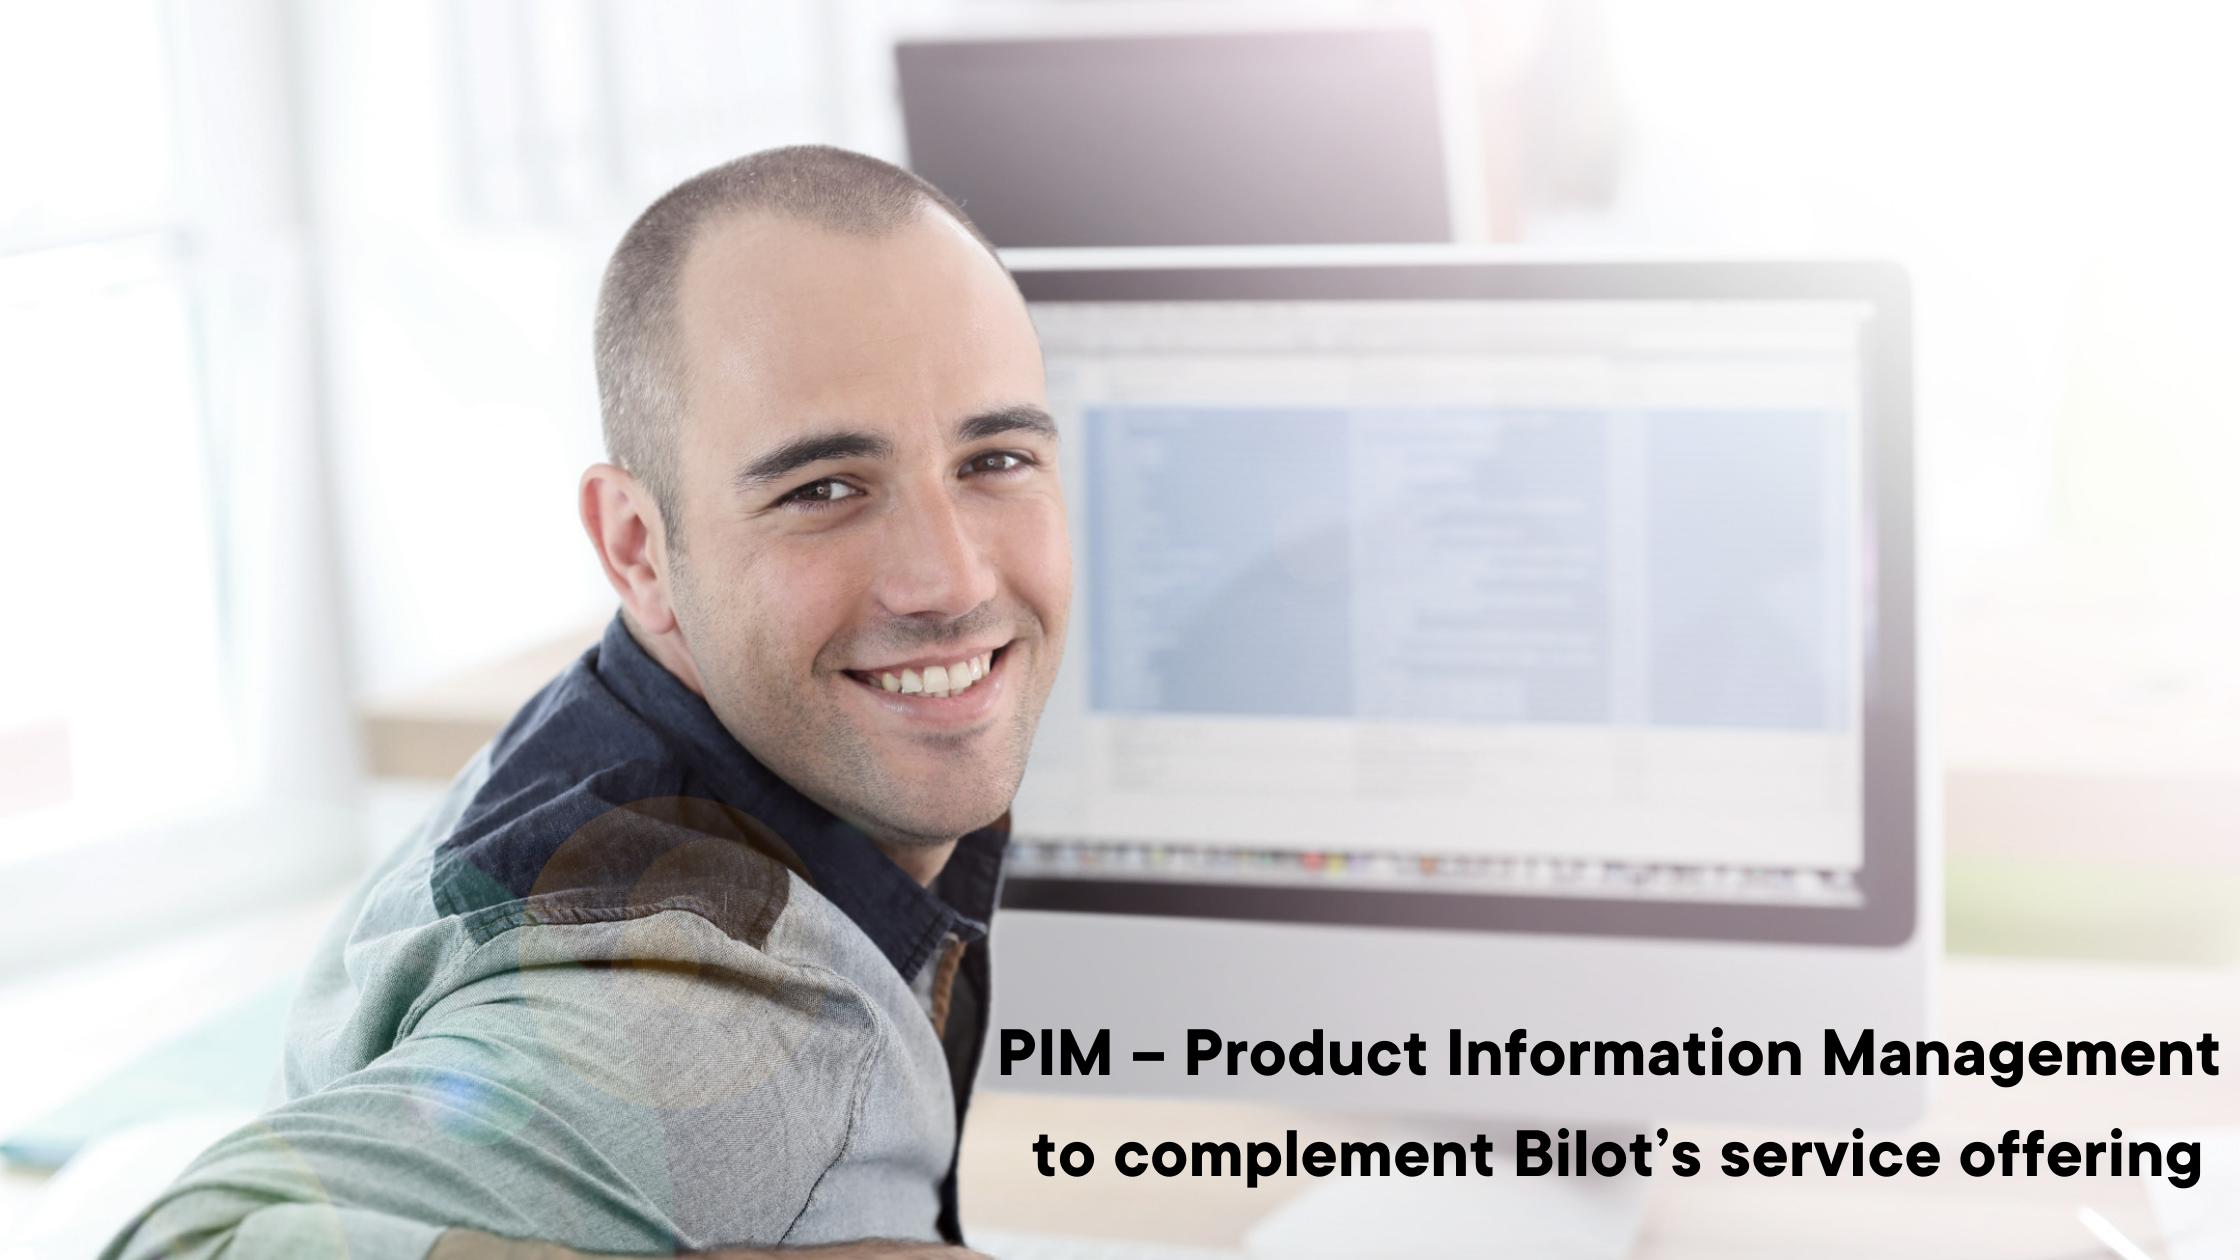 PIM – Product Information Management to complement Bilot's service offering-1